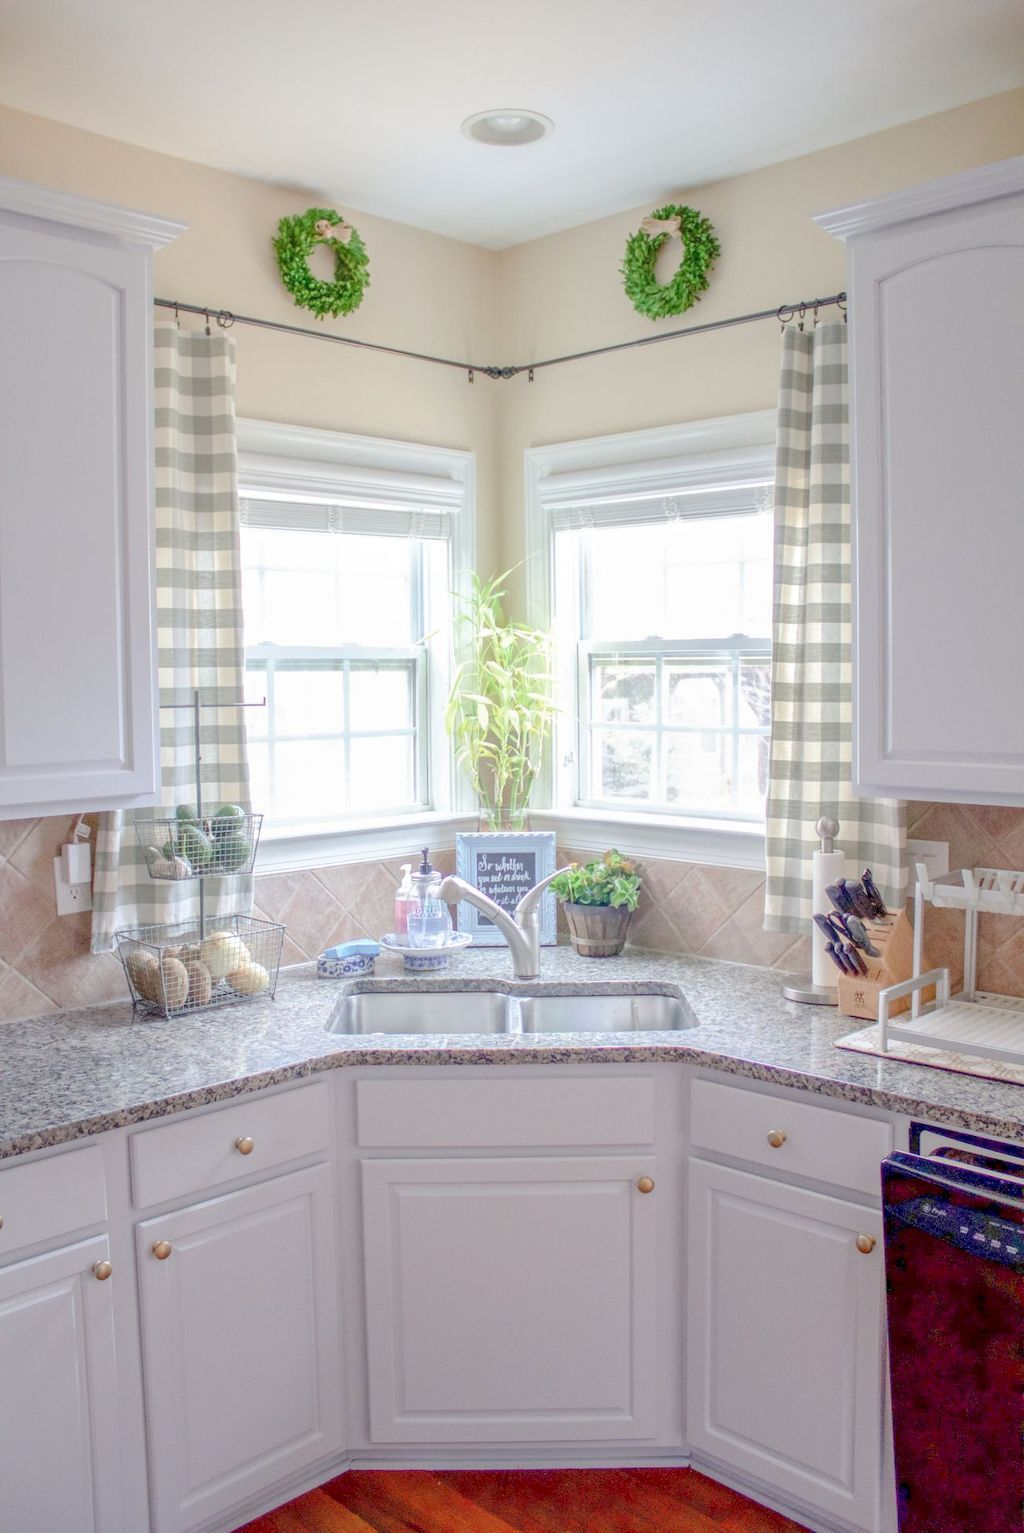 Kitchen window treatment ideas  kitchen window treatments ideas for less in   decoración